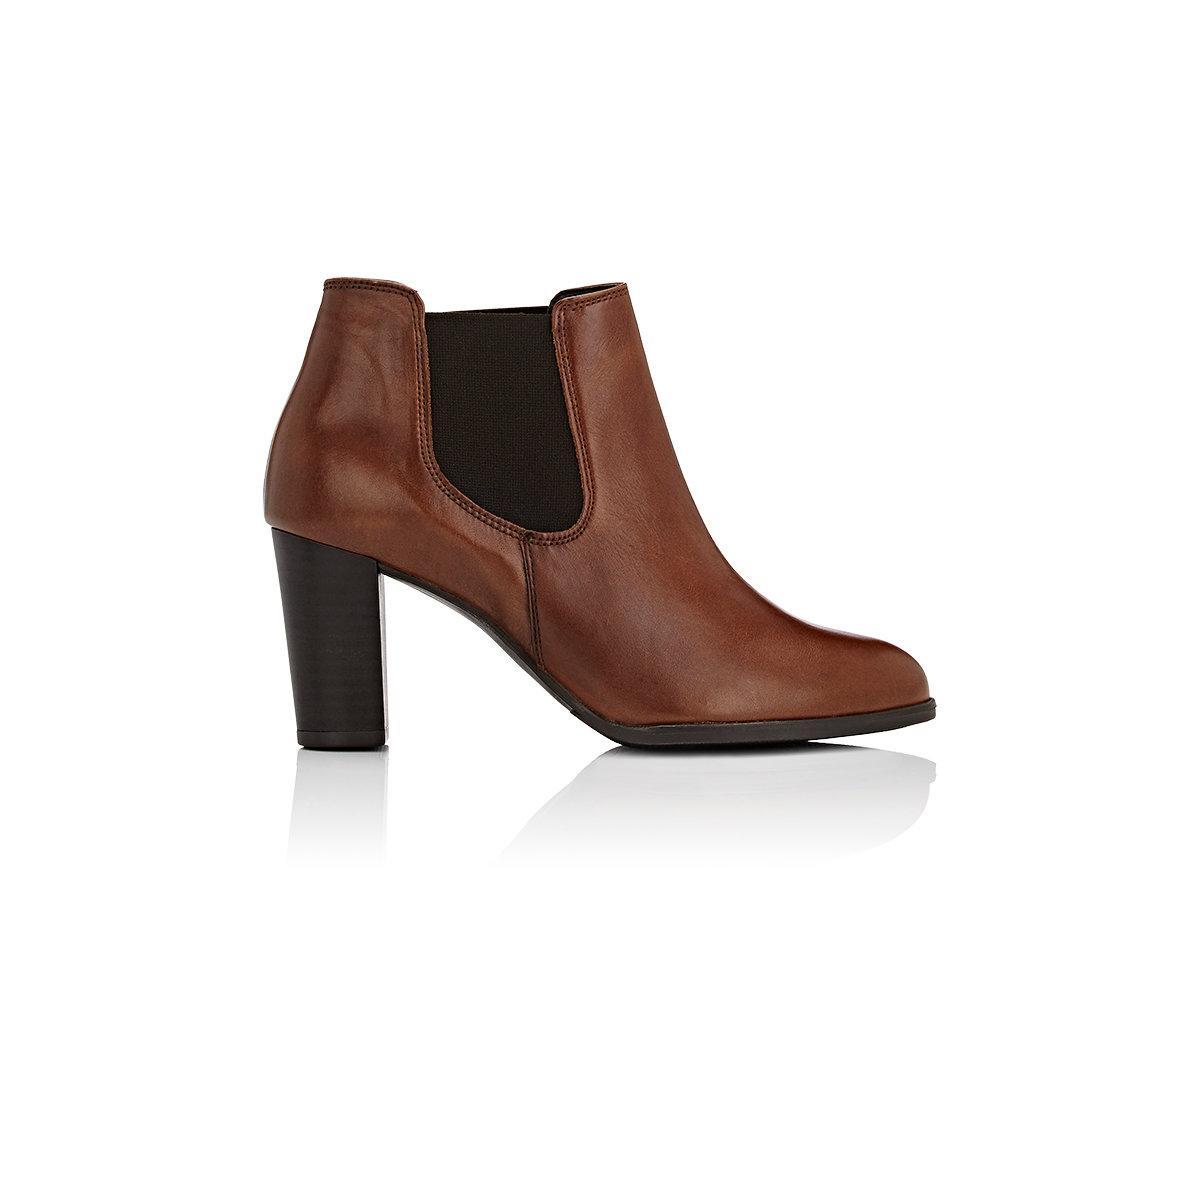 Barneys Warehouse Womens Shoes